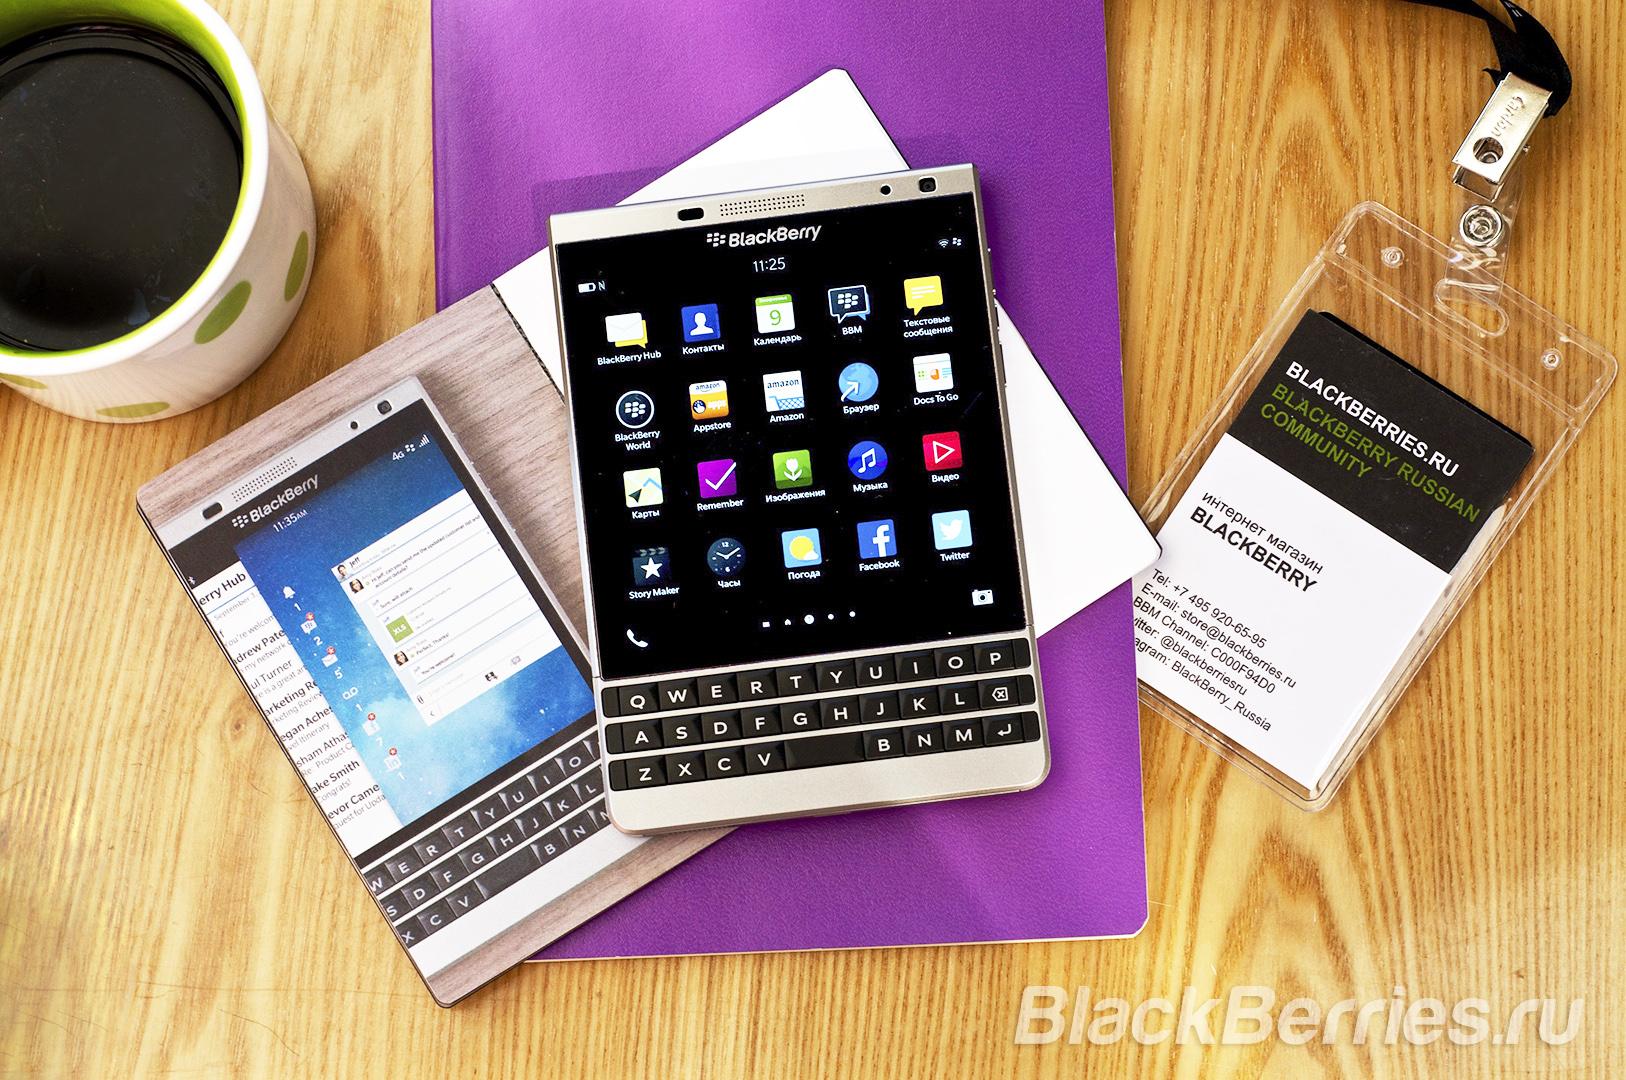 BlackBerry-Passport-Silver-Edition-Review-291